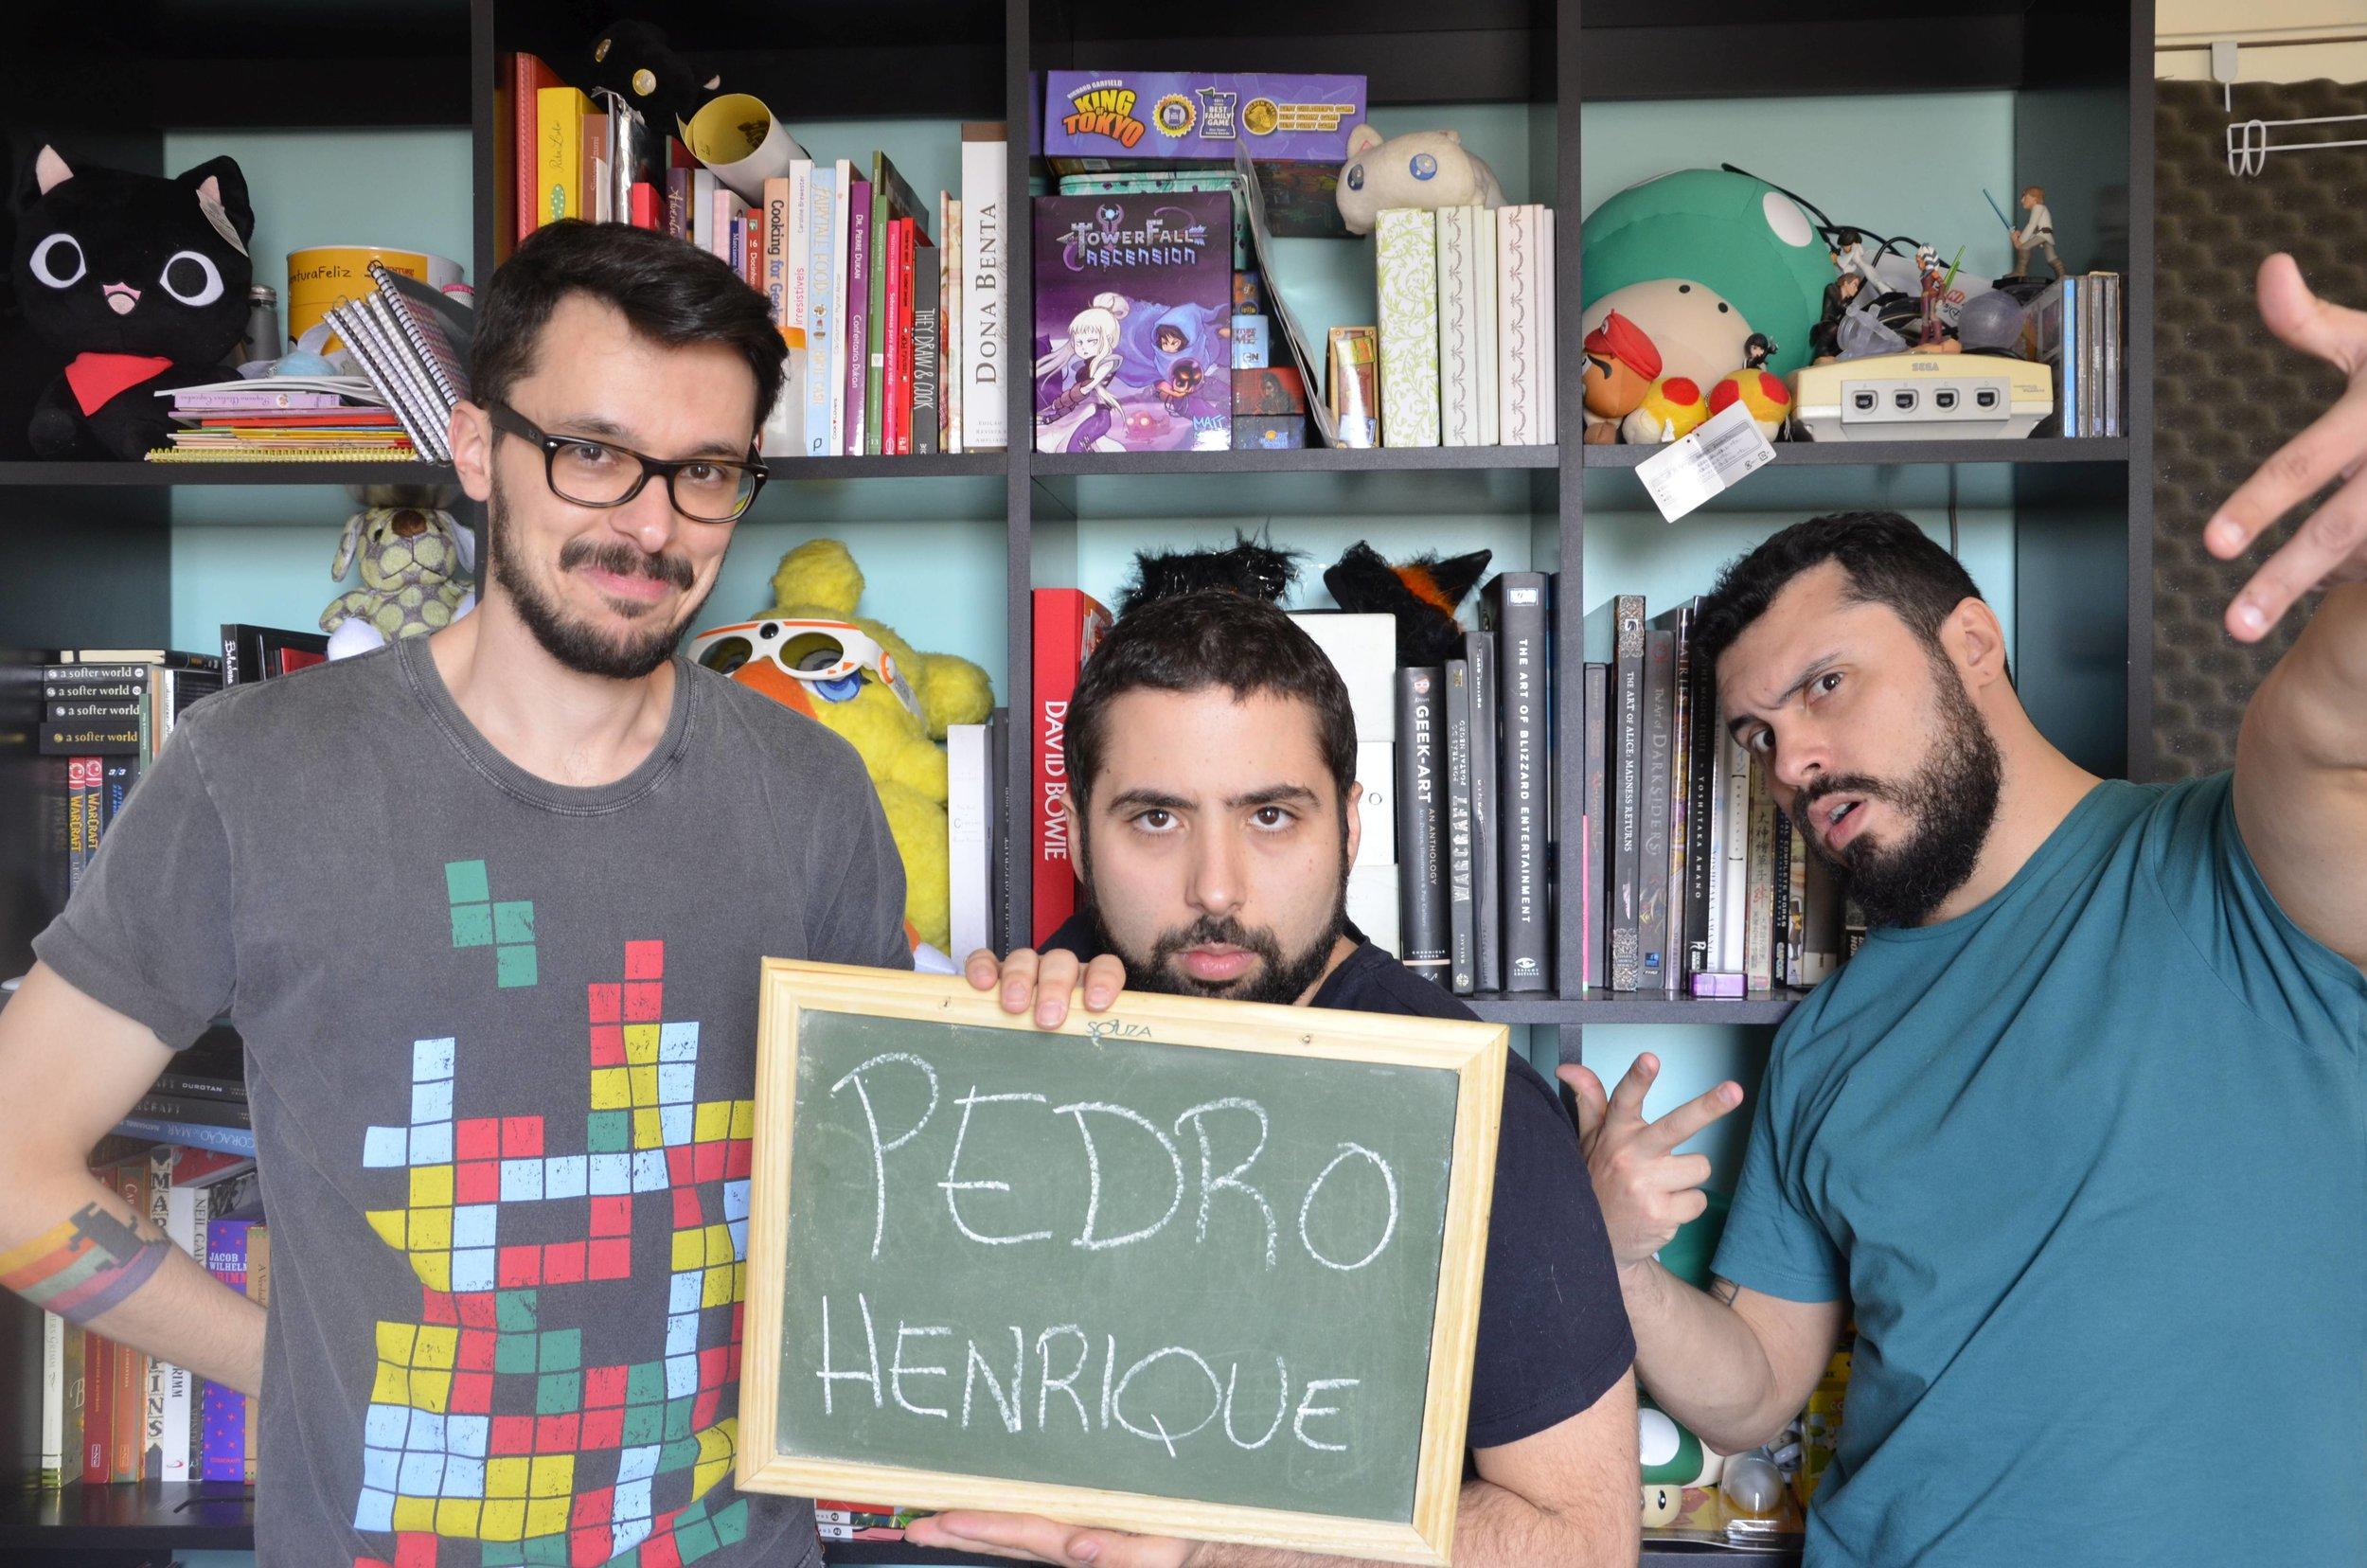 Pedro-Henrique.jpg